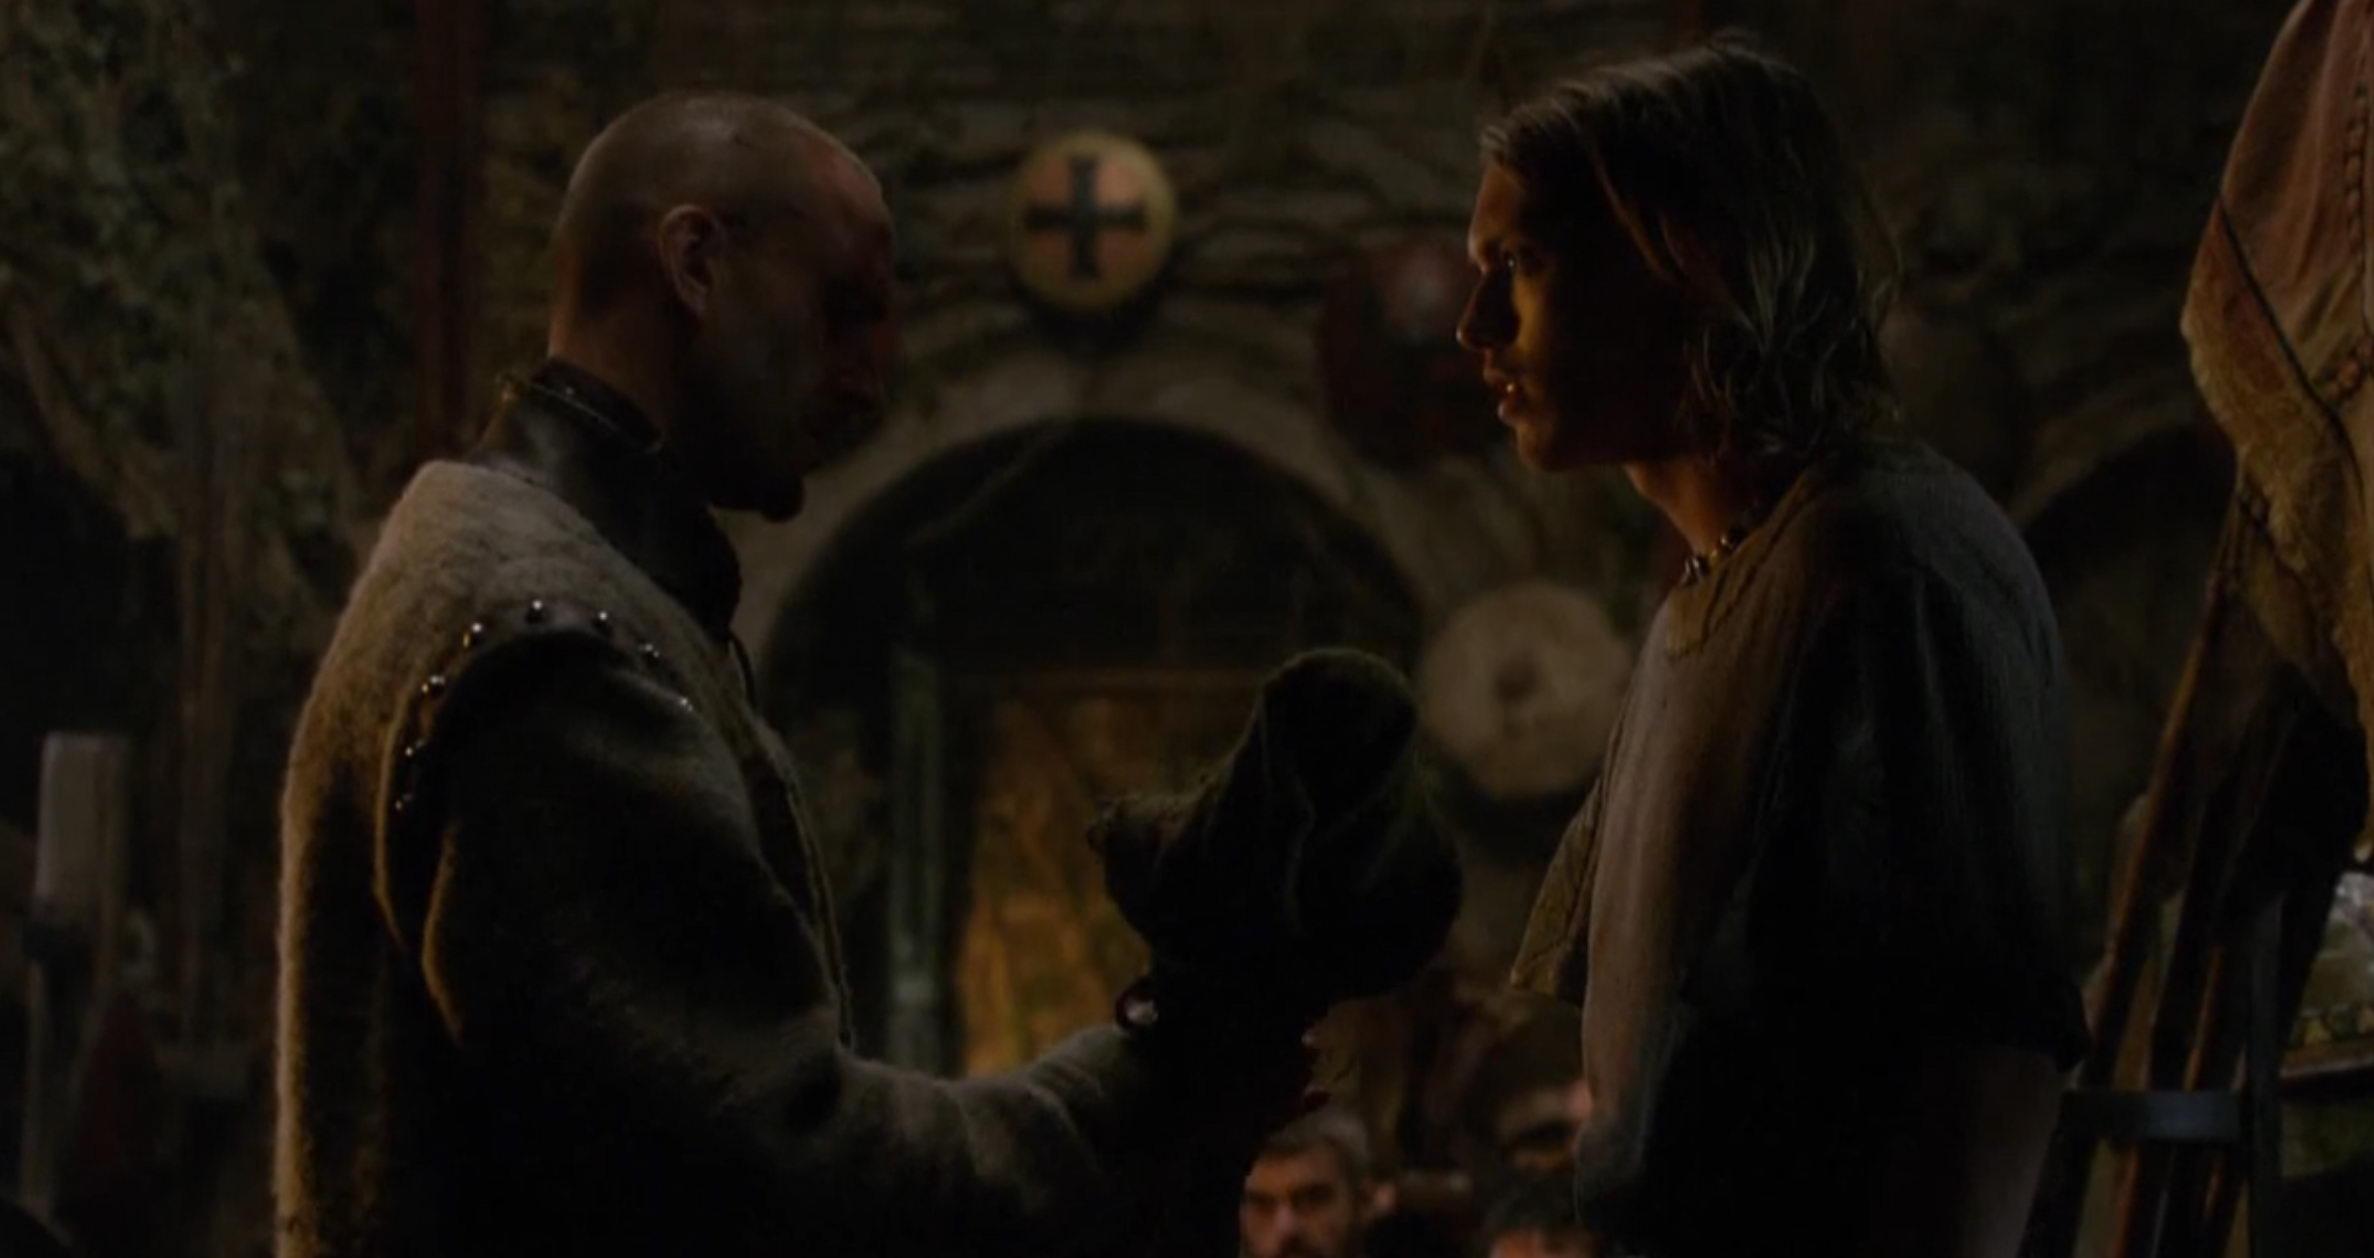 Мерлин вручает Артуру меч